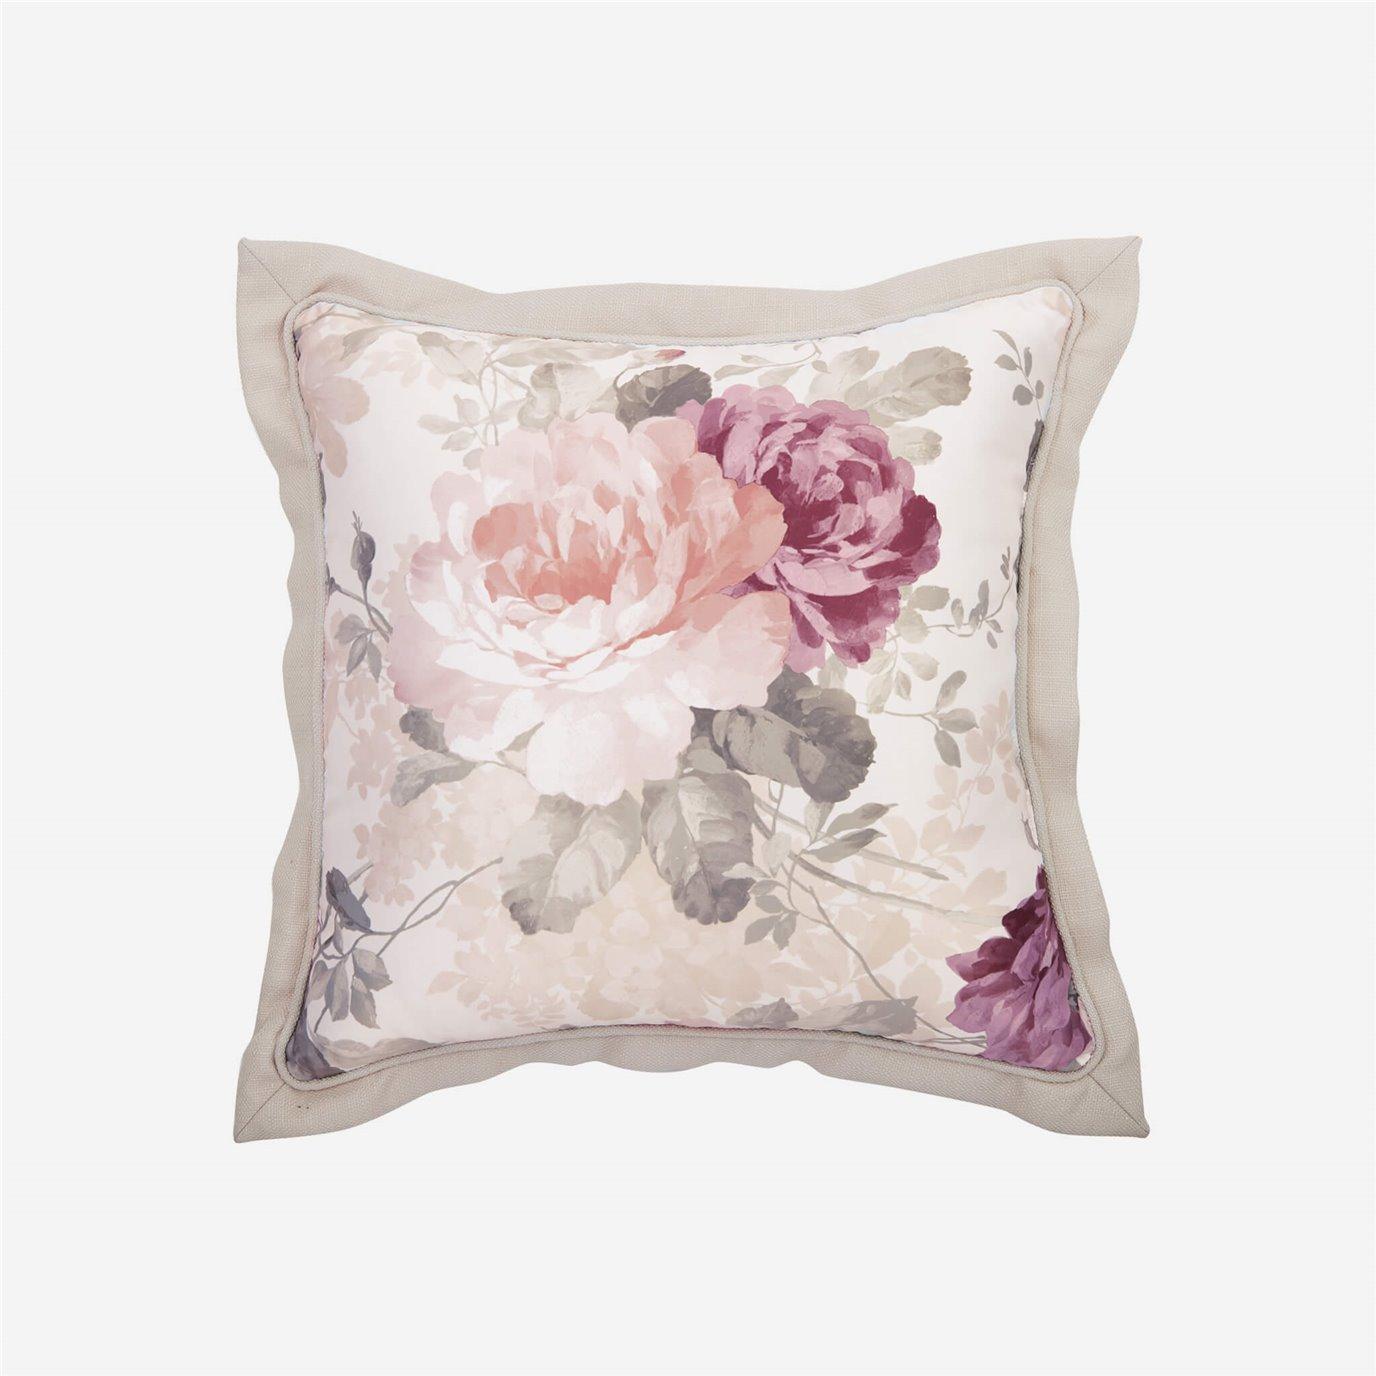 Croscill Bela Square Pillow 20x20